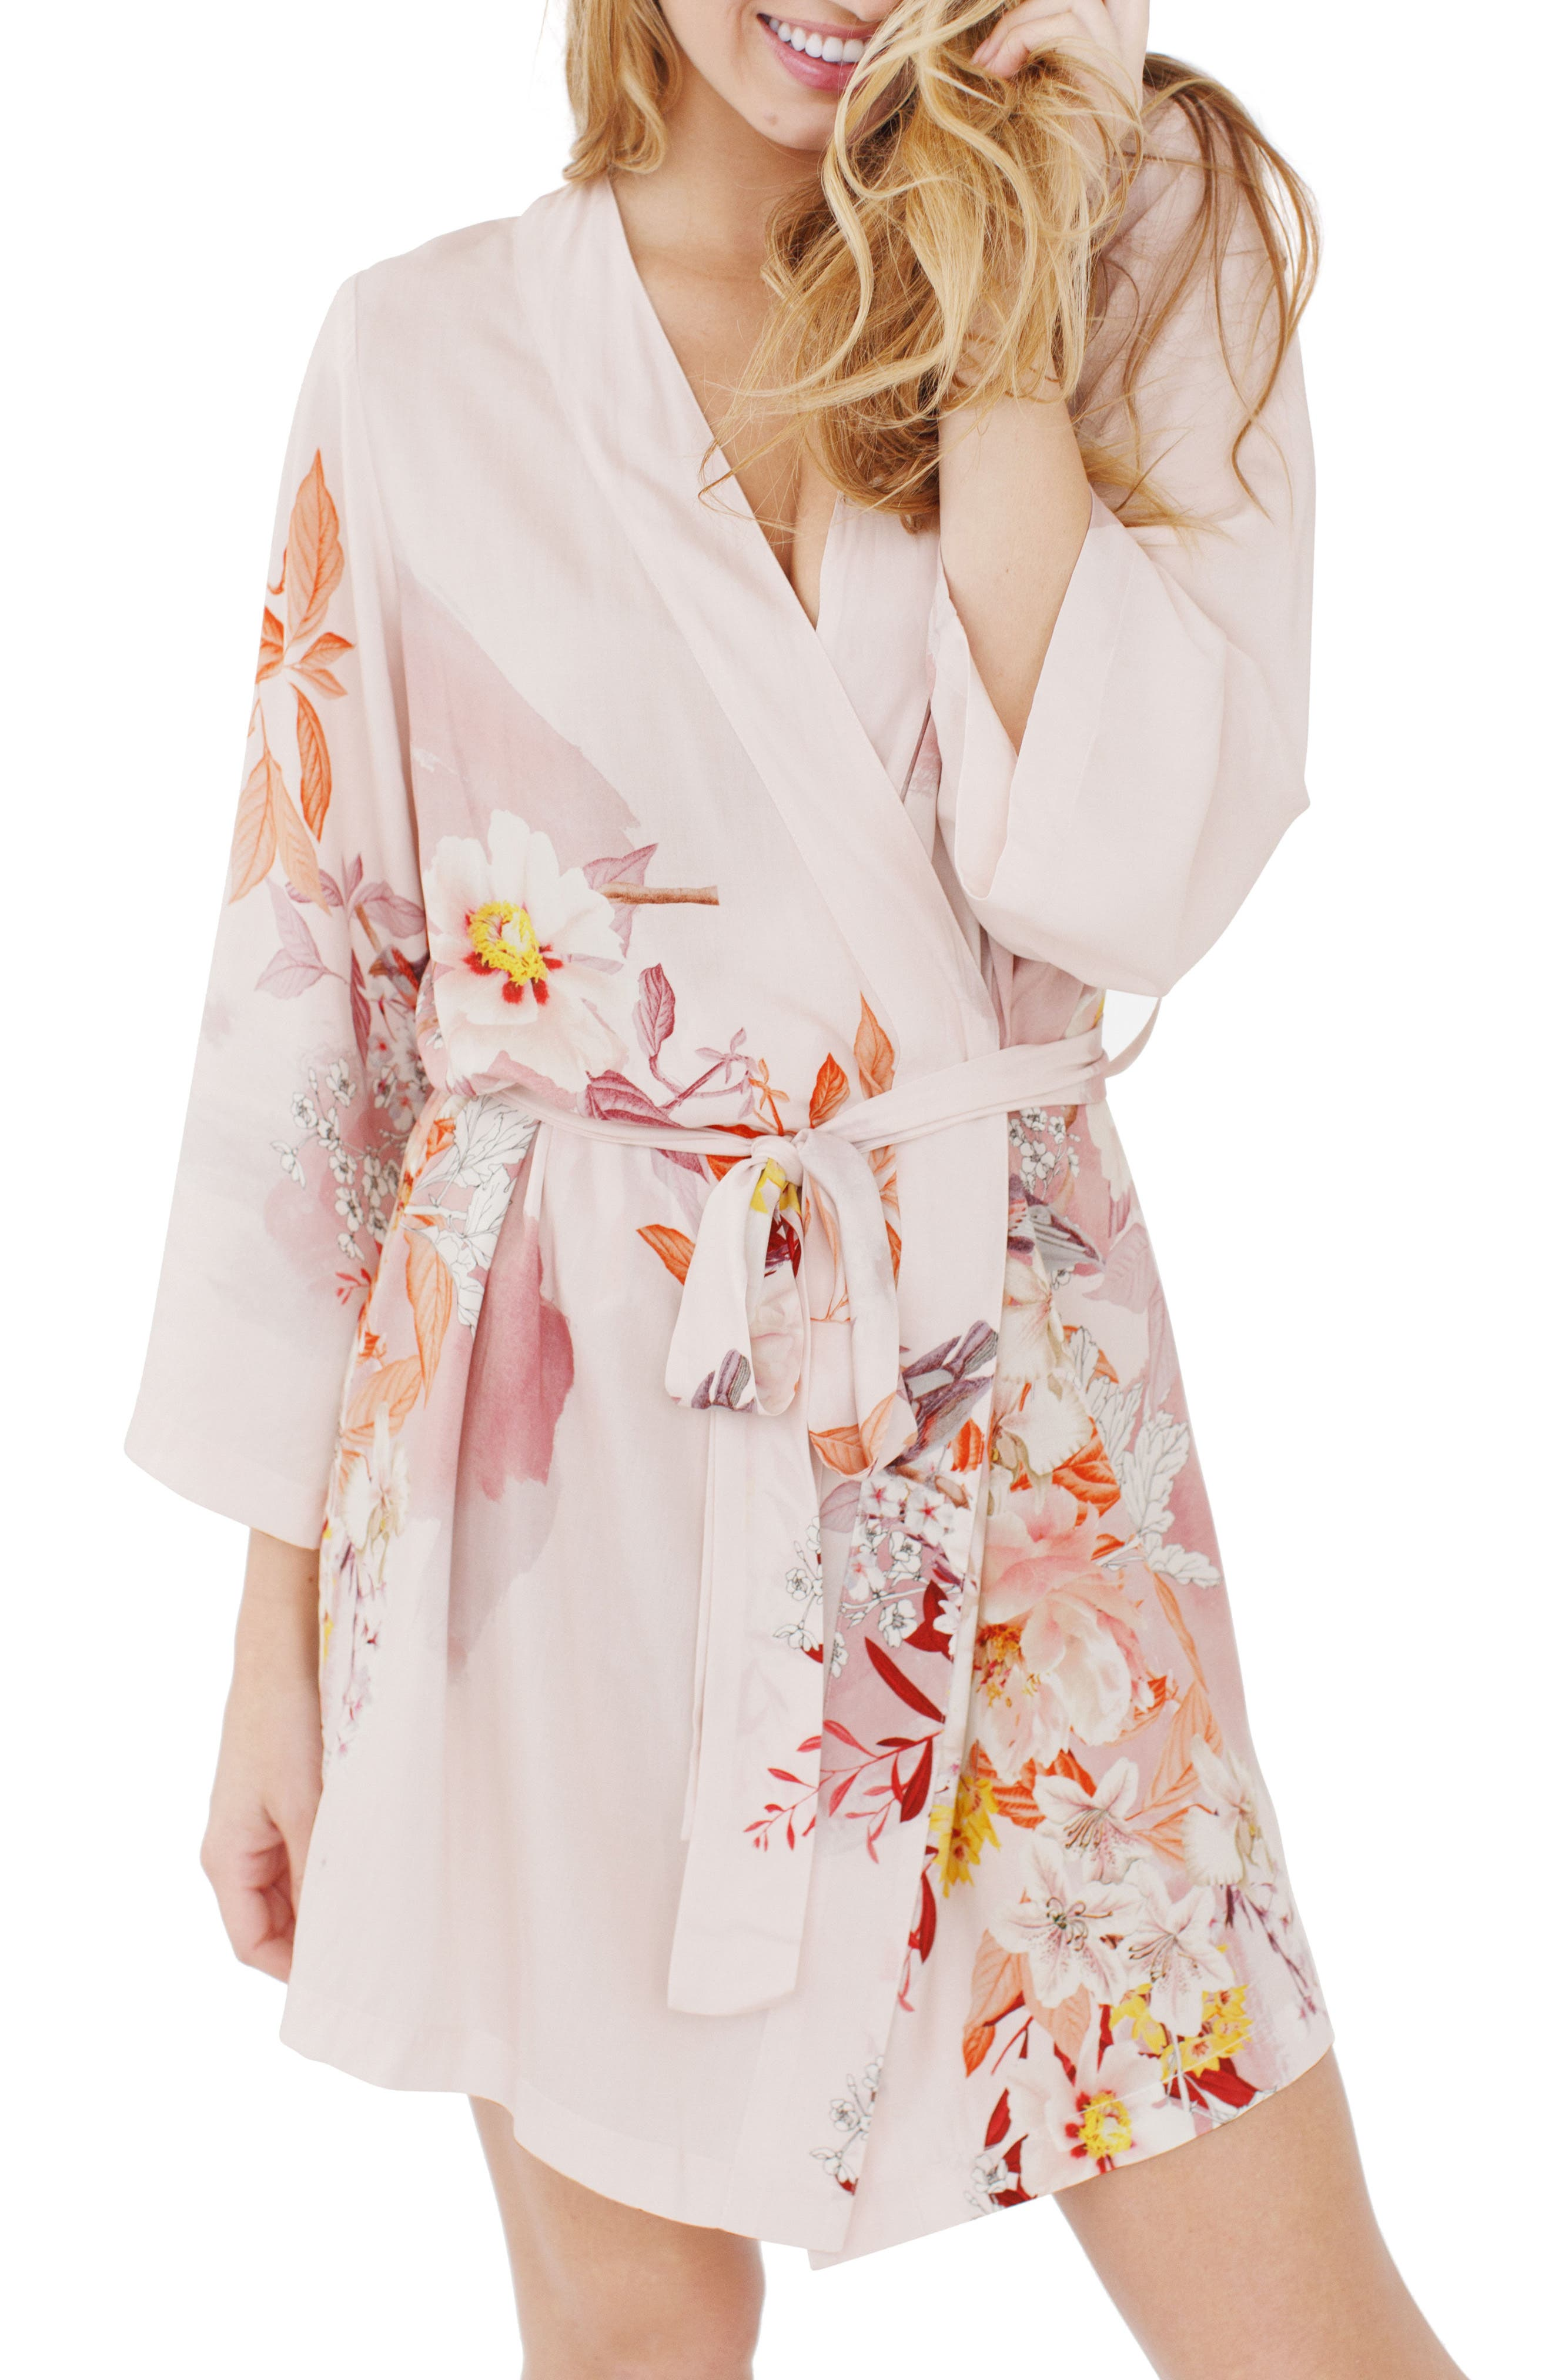 Floral Kimono Robe,                             Alternate thumbnail 2, color,                             Neverland